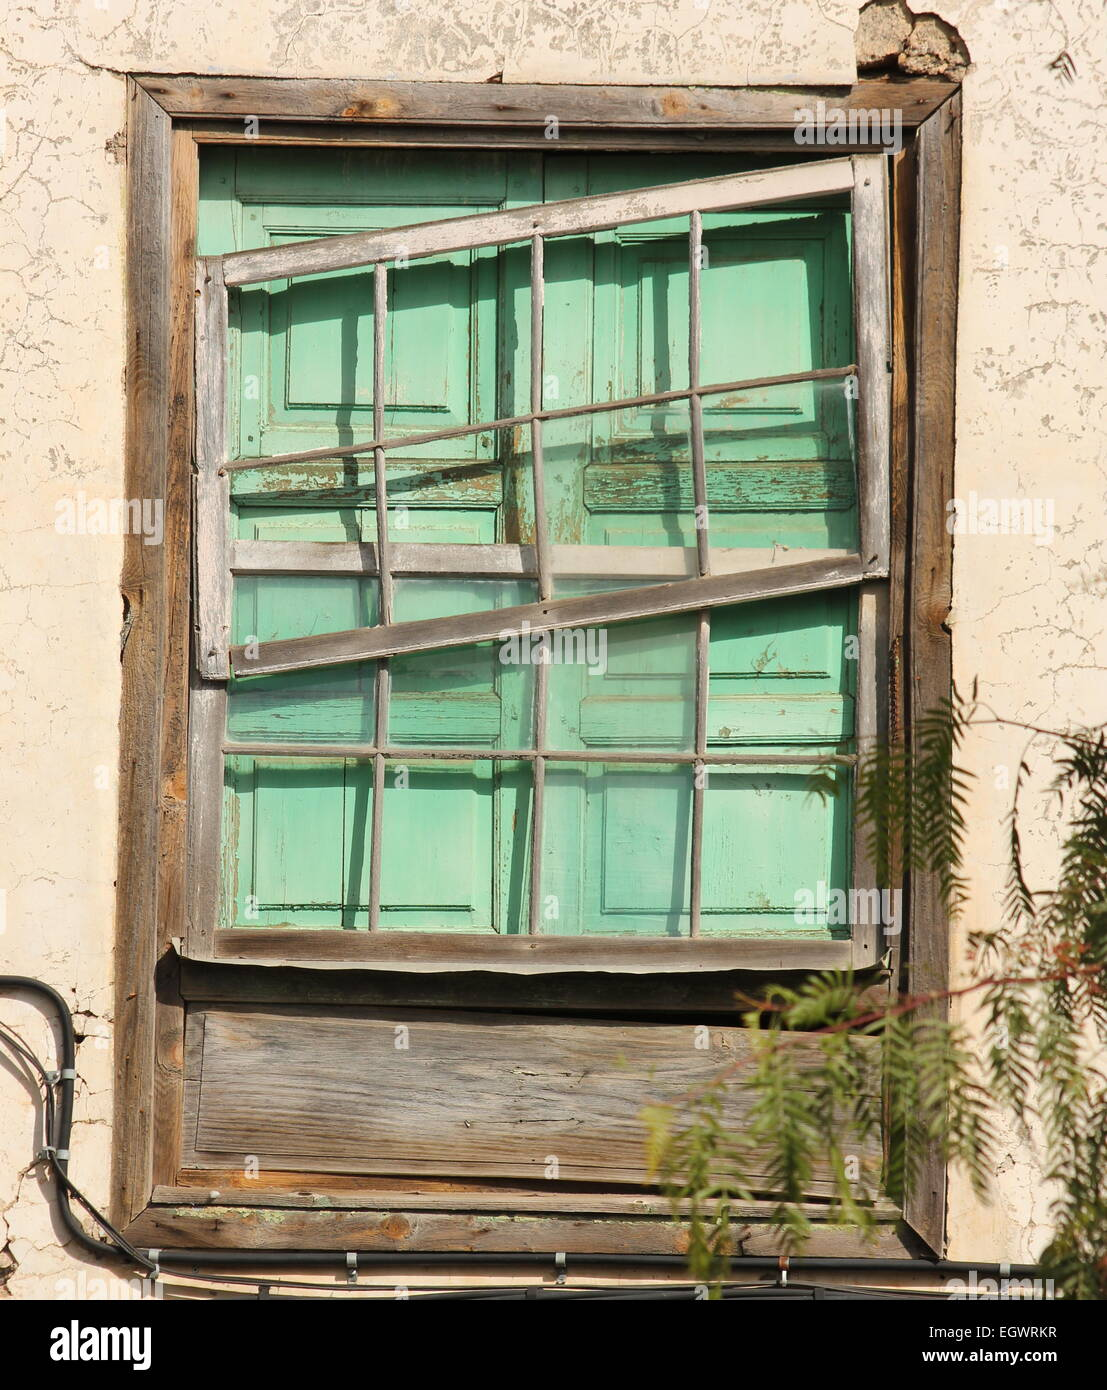 mint green shutters broken sash window frame old window vilaflor tenerife